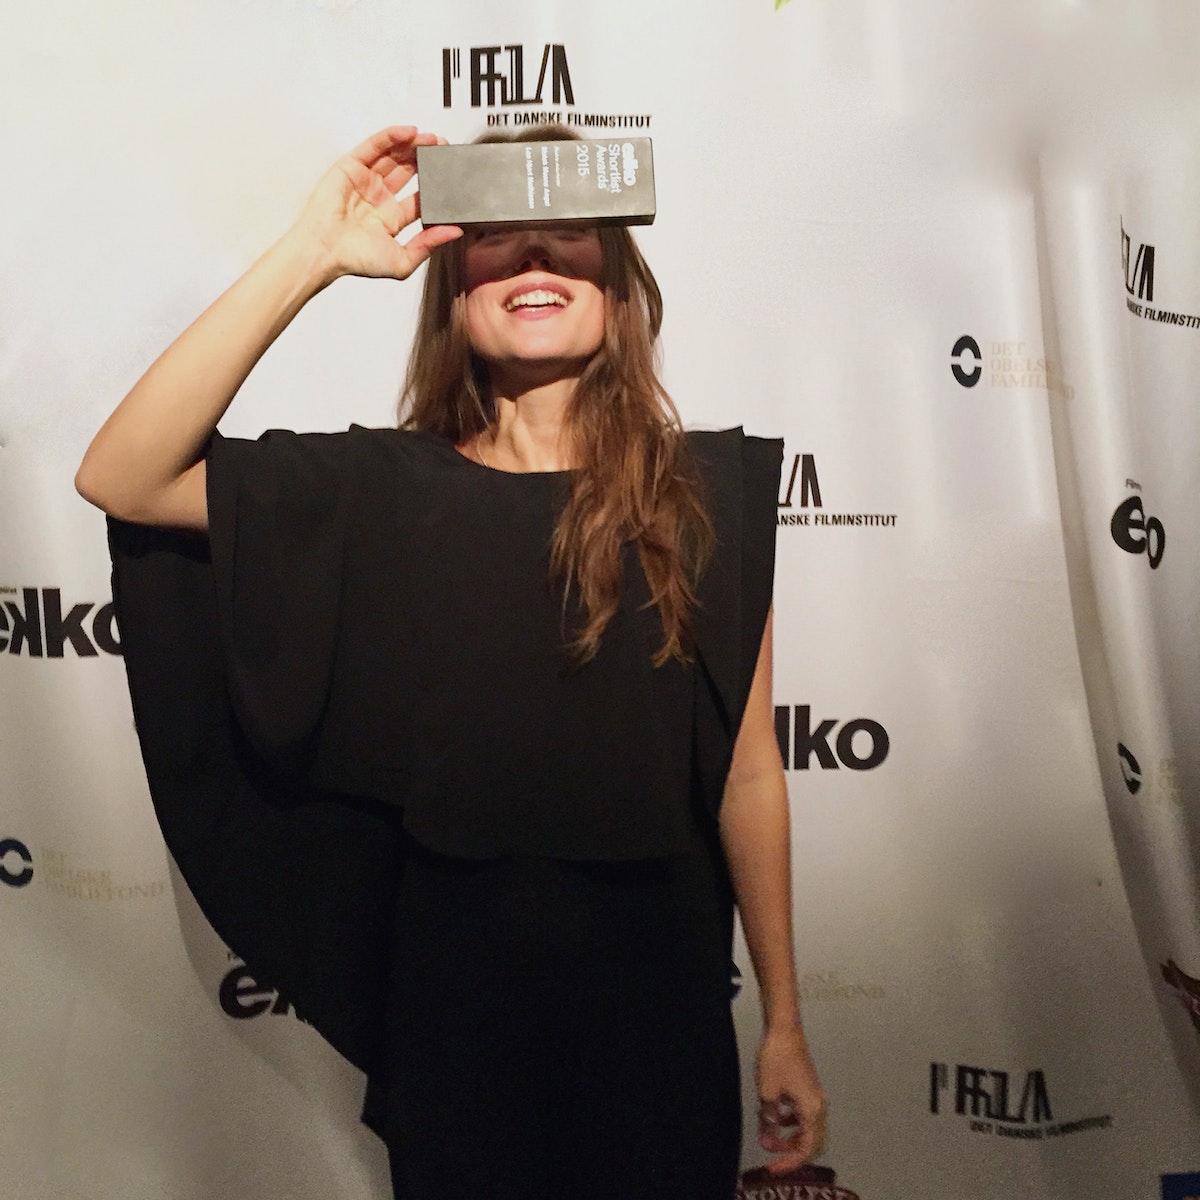 Malek Means Angel wins Best Documentary